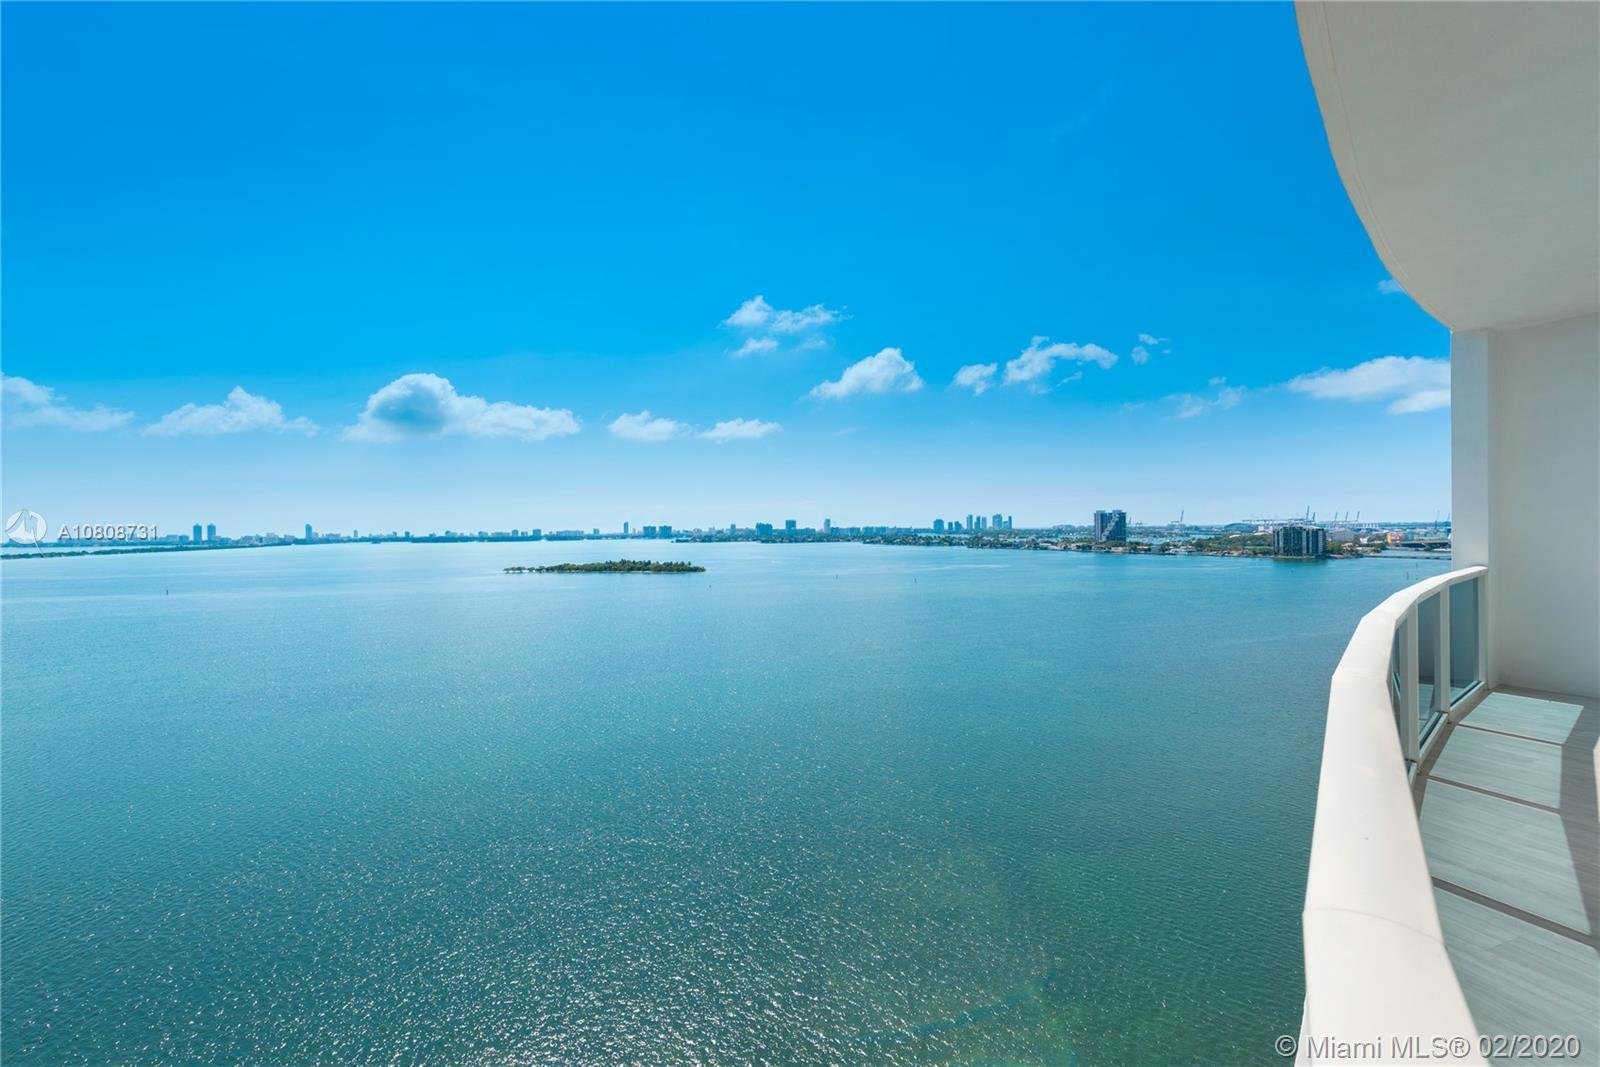 725 NE 22nd St, 16F - Miami, Florida